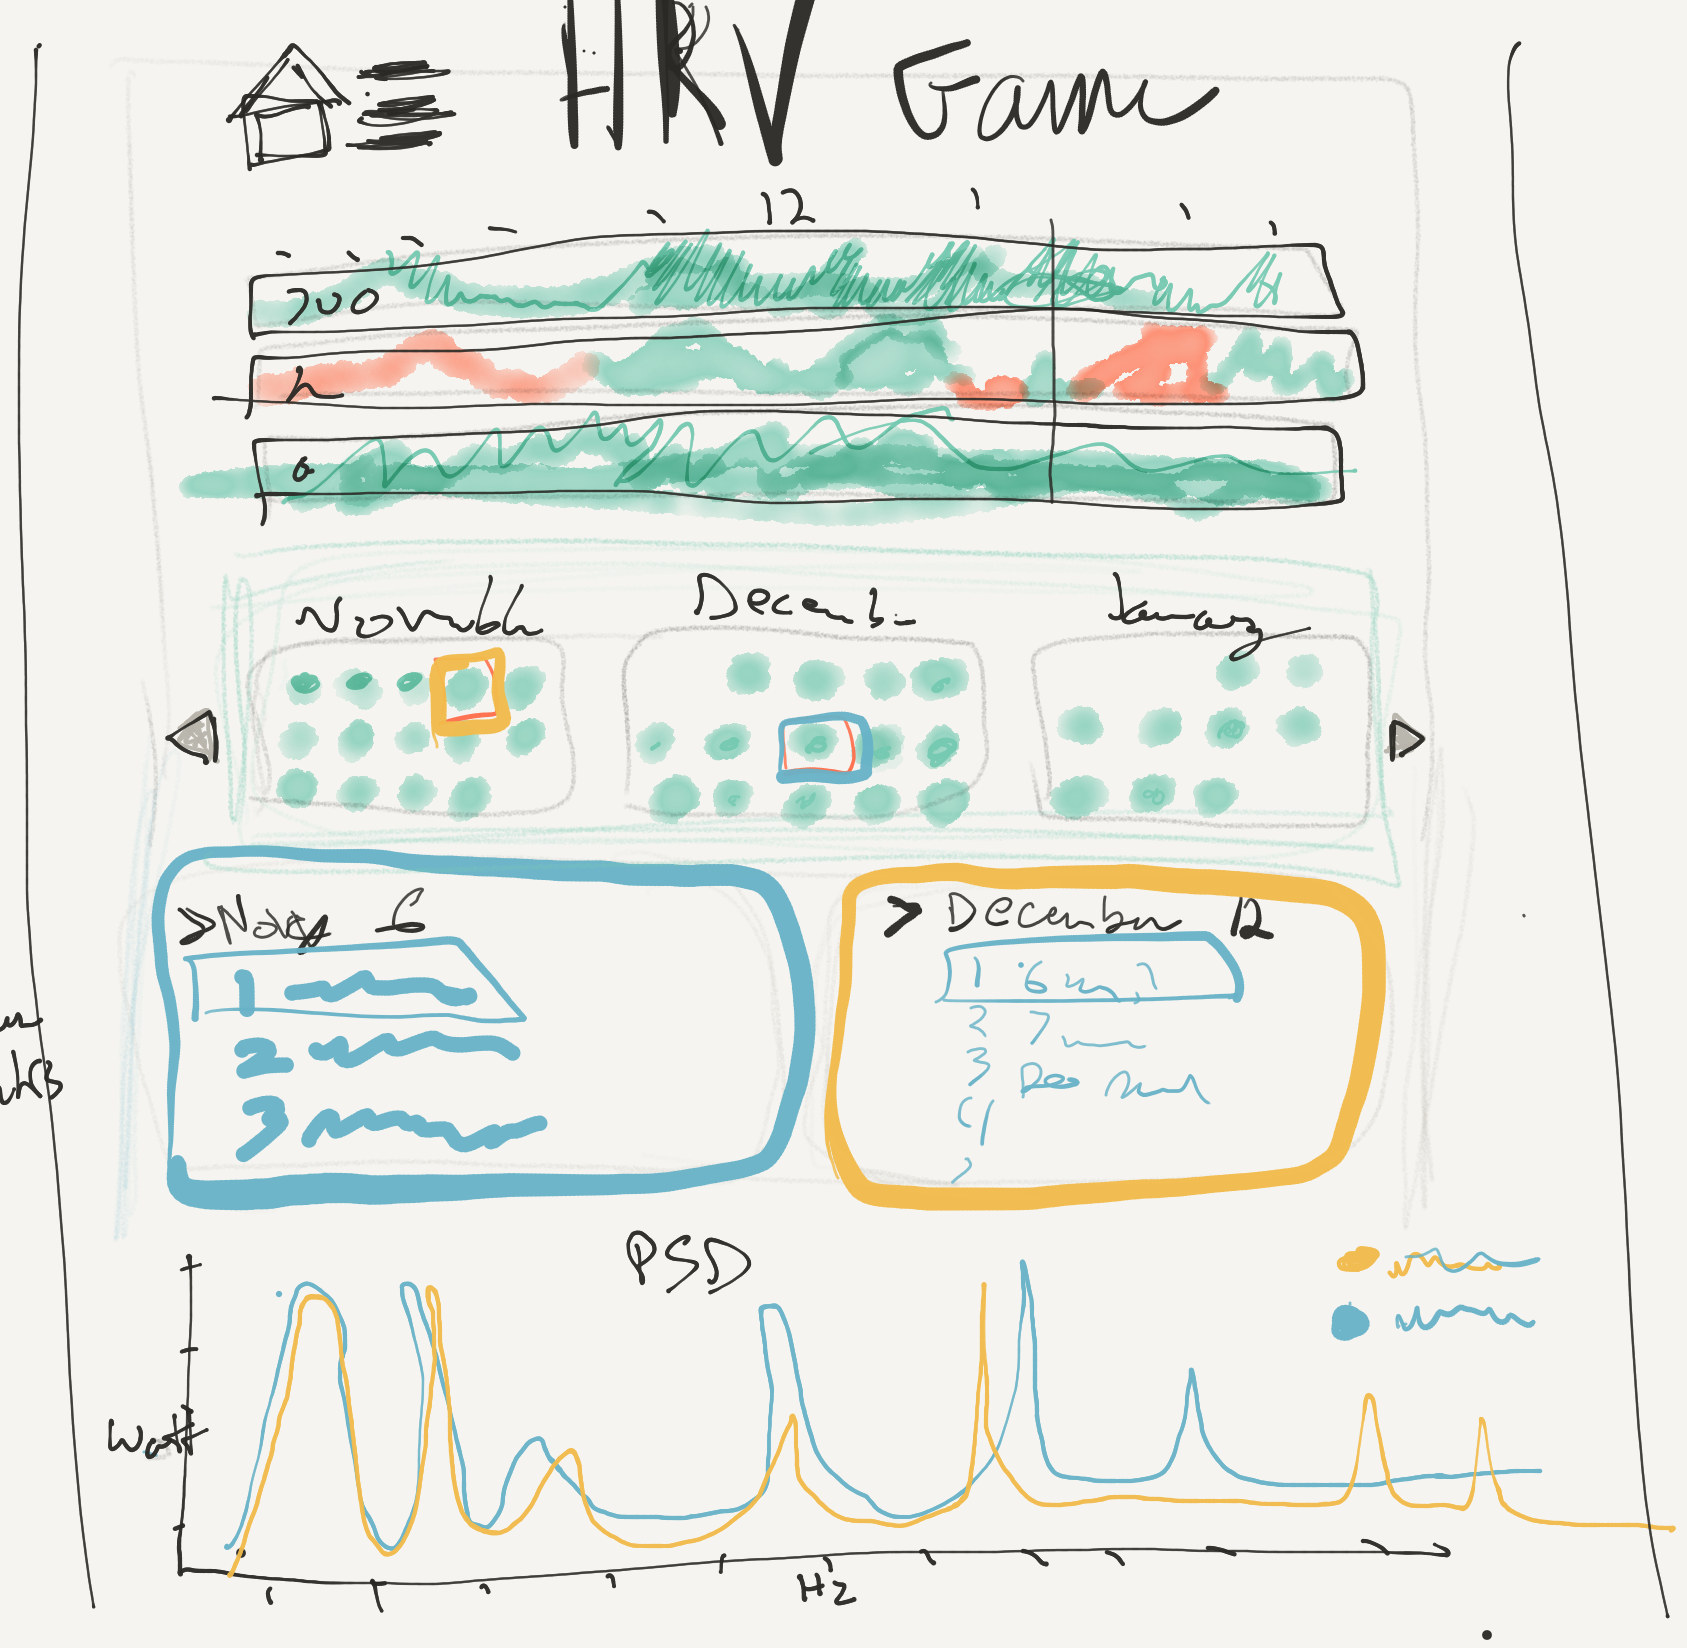 HRV Biofeedback